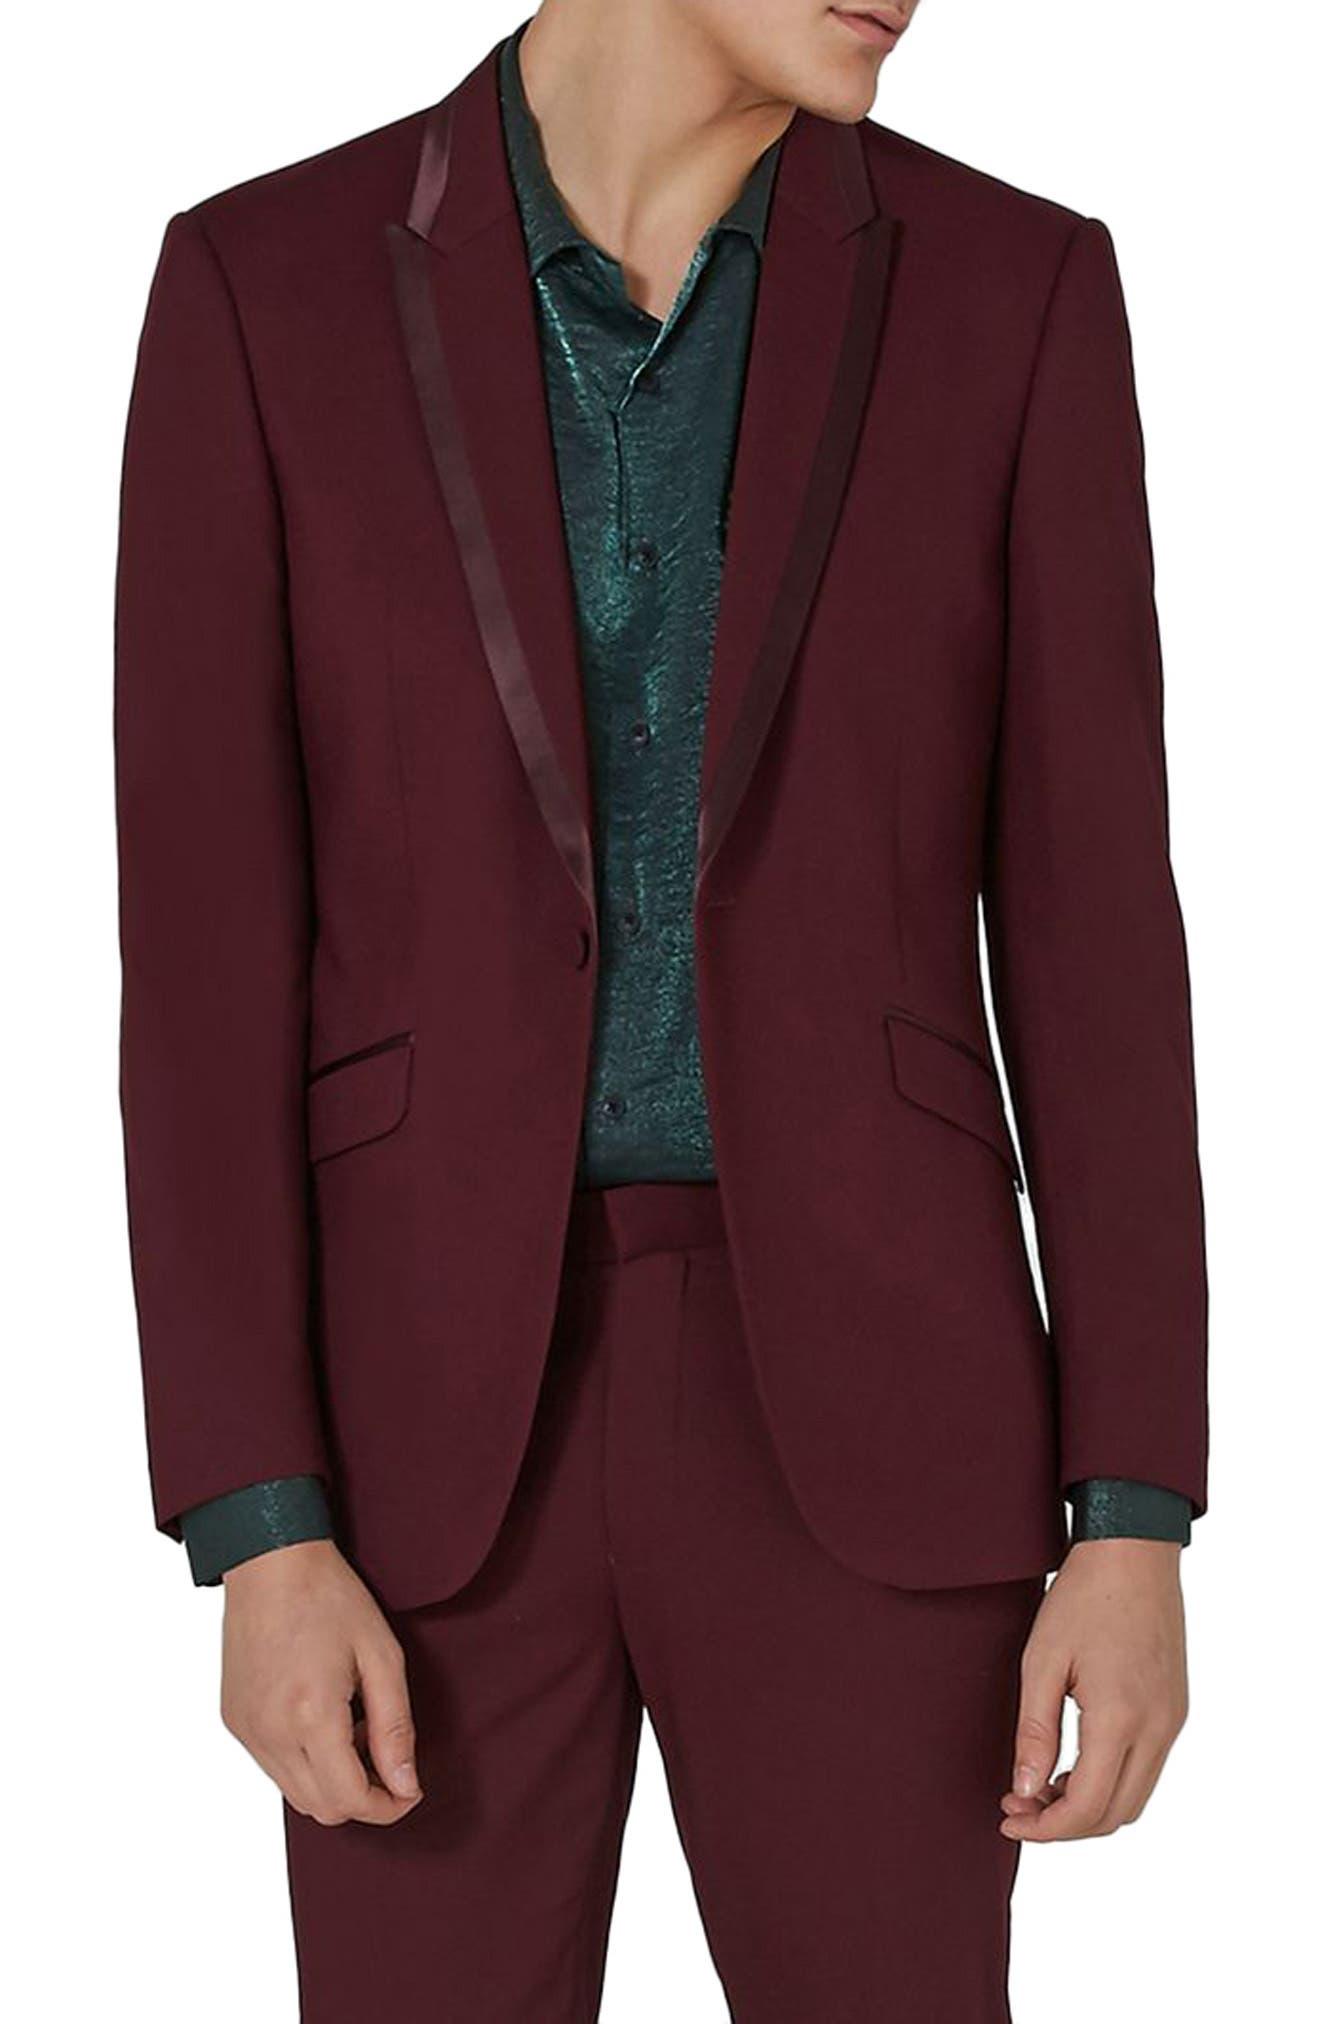 Main Image - Topman Skinny Fit Burgundy Tuxedo Jacket